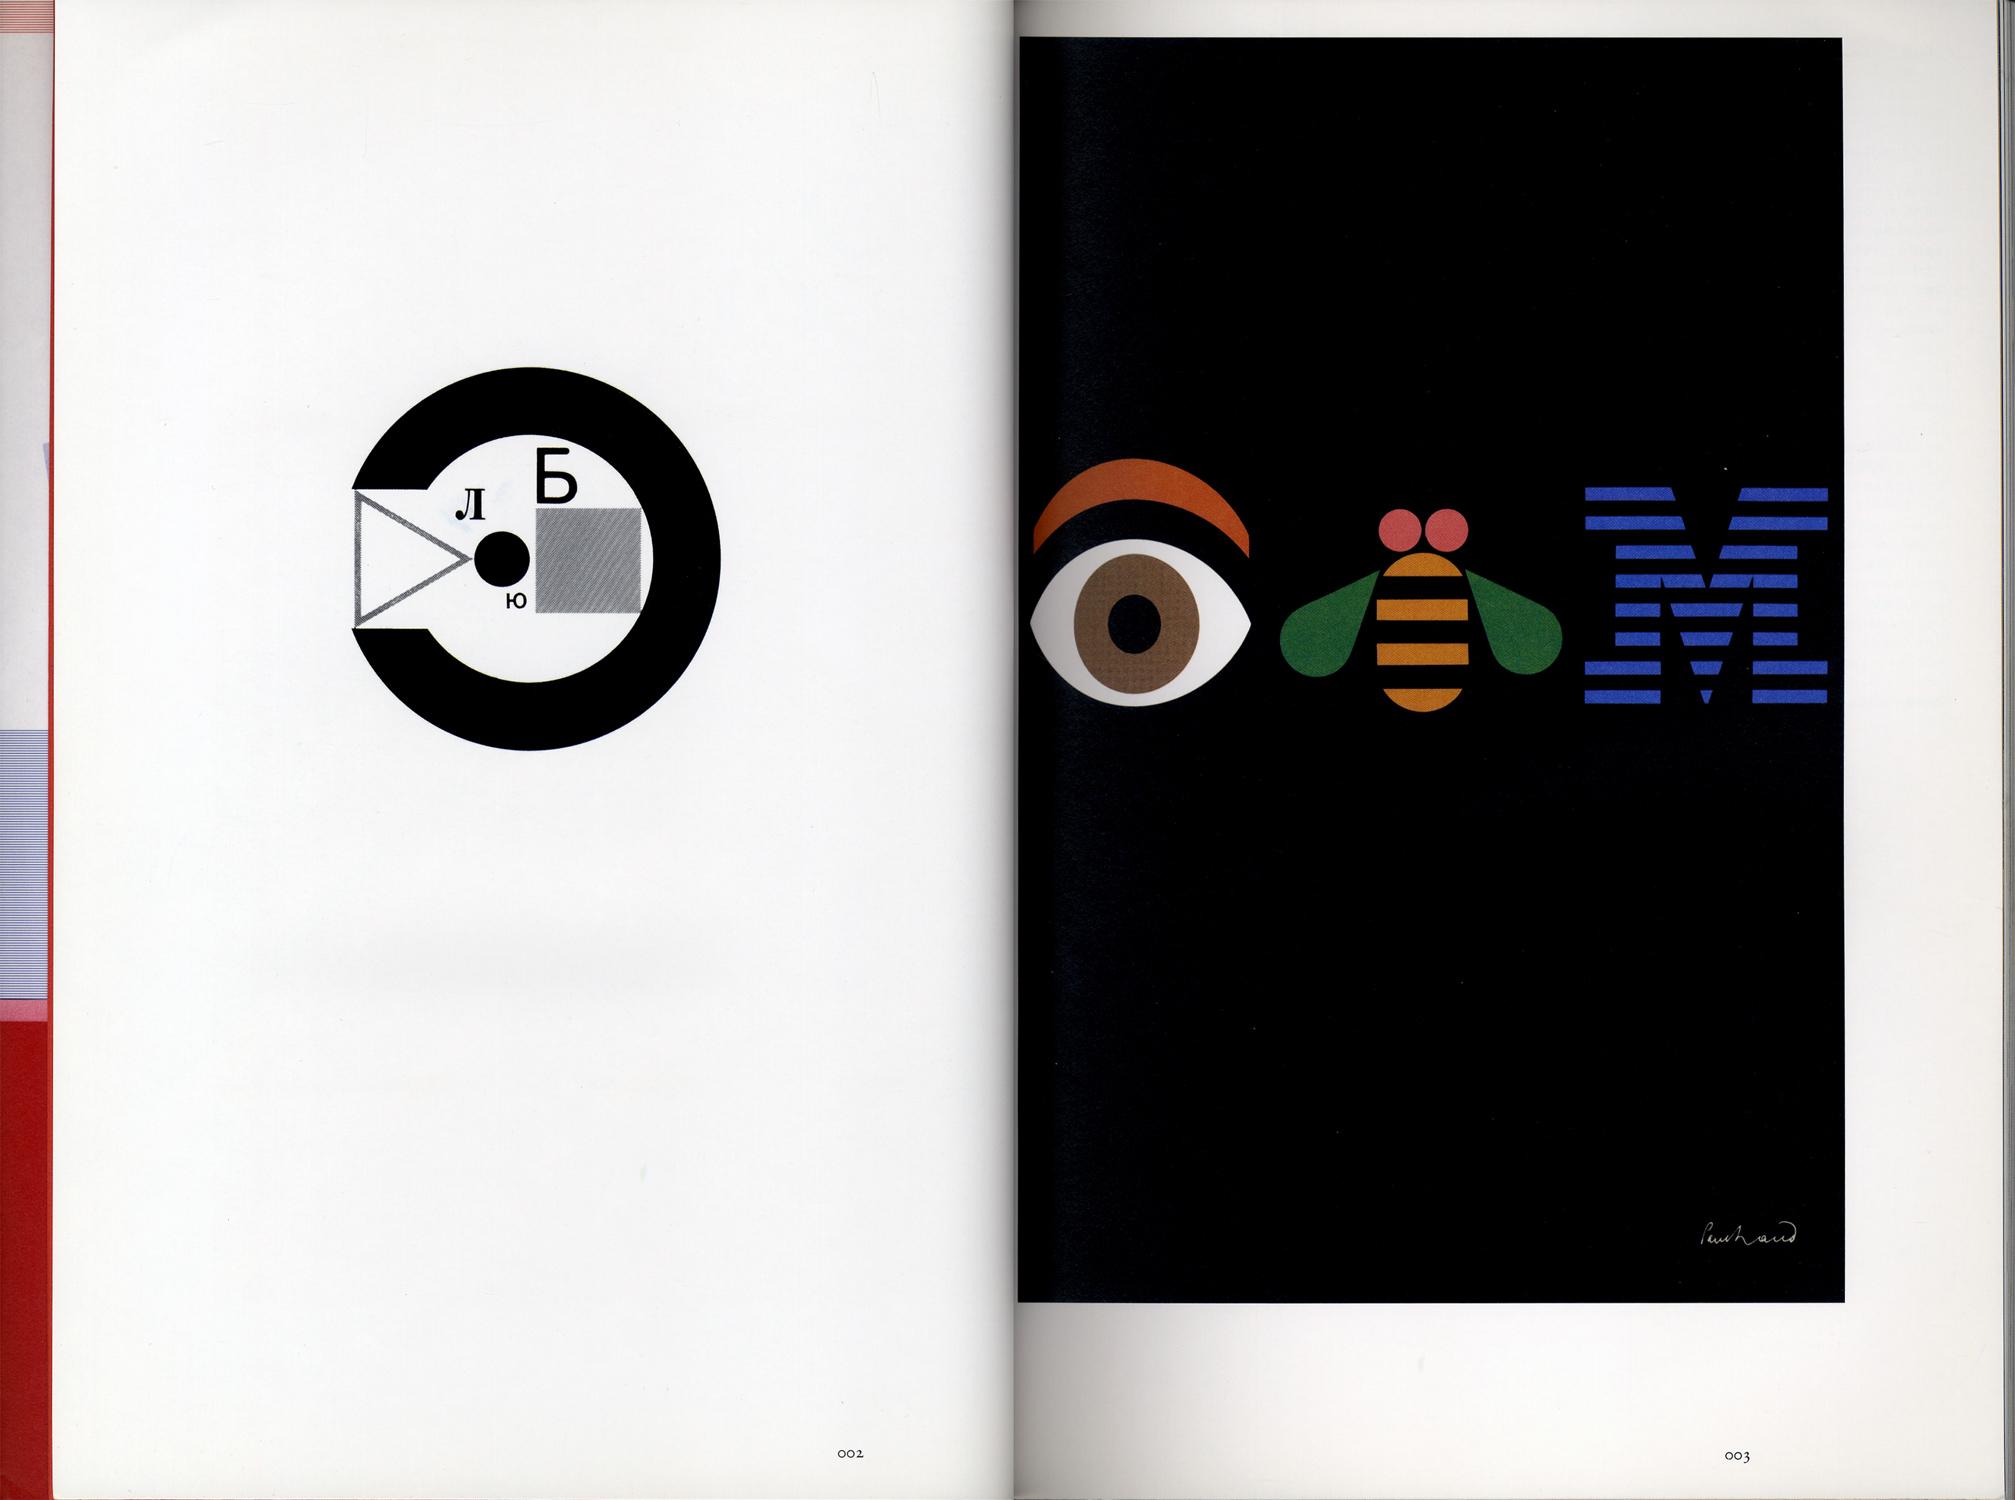 graphic design 視覚伝達デザイン基礎[image2]